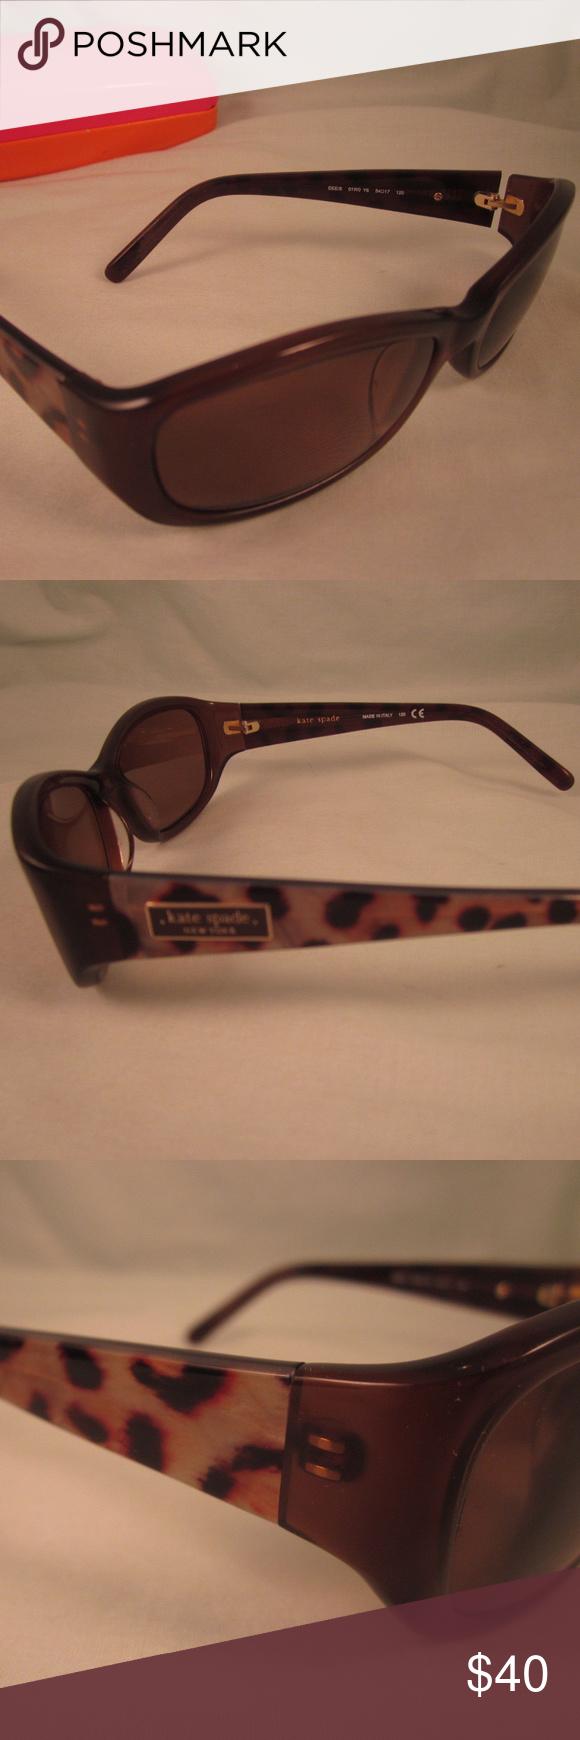 76a26532c2 KATE SPADE Rx Sunglasses DEE S Brown LEOPARD